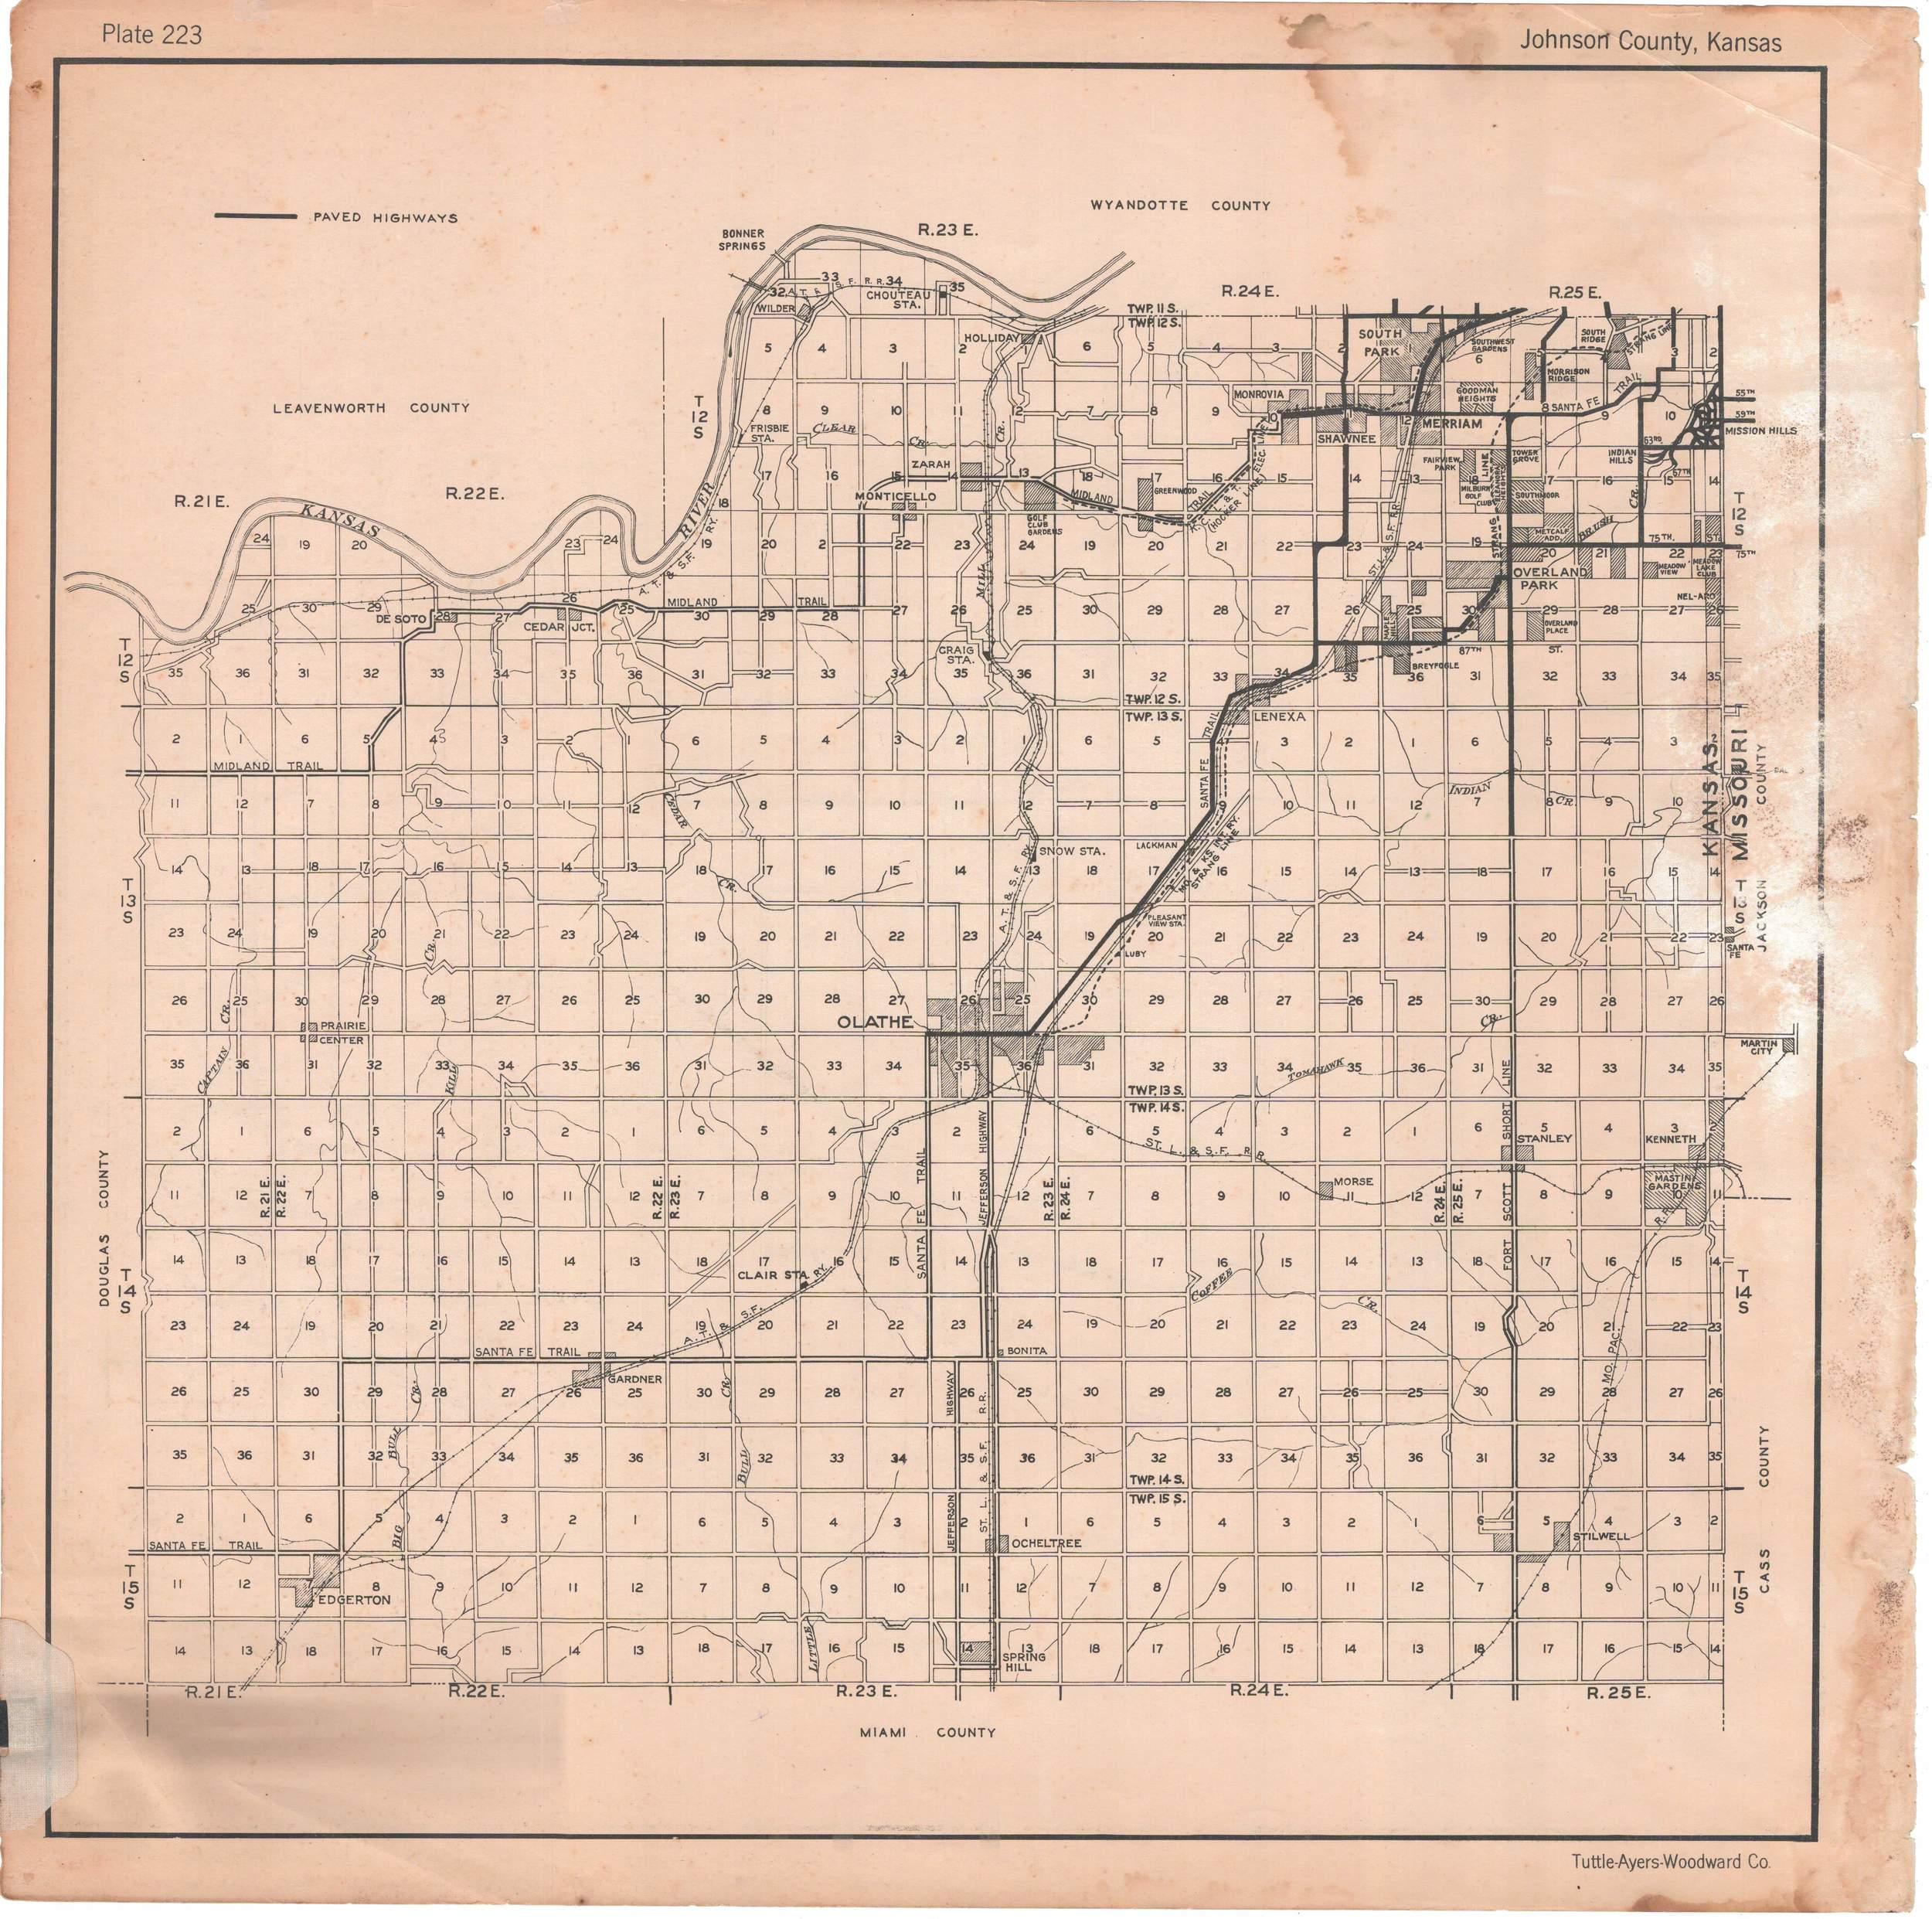 1925 TUTTLE_AYERS_Plate_223.JPG